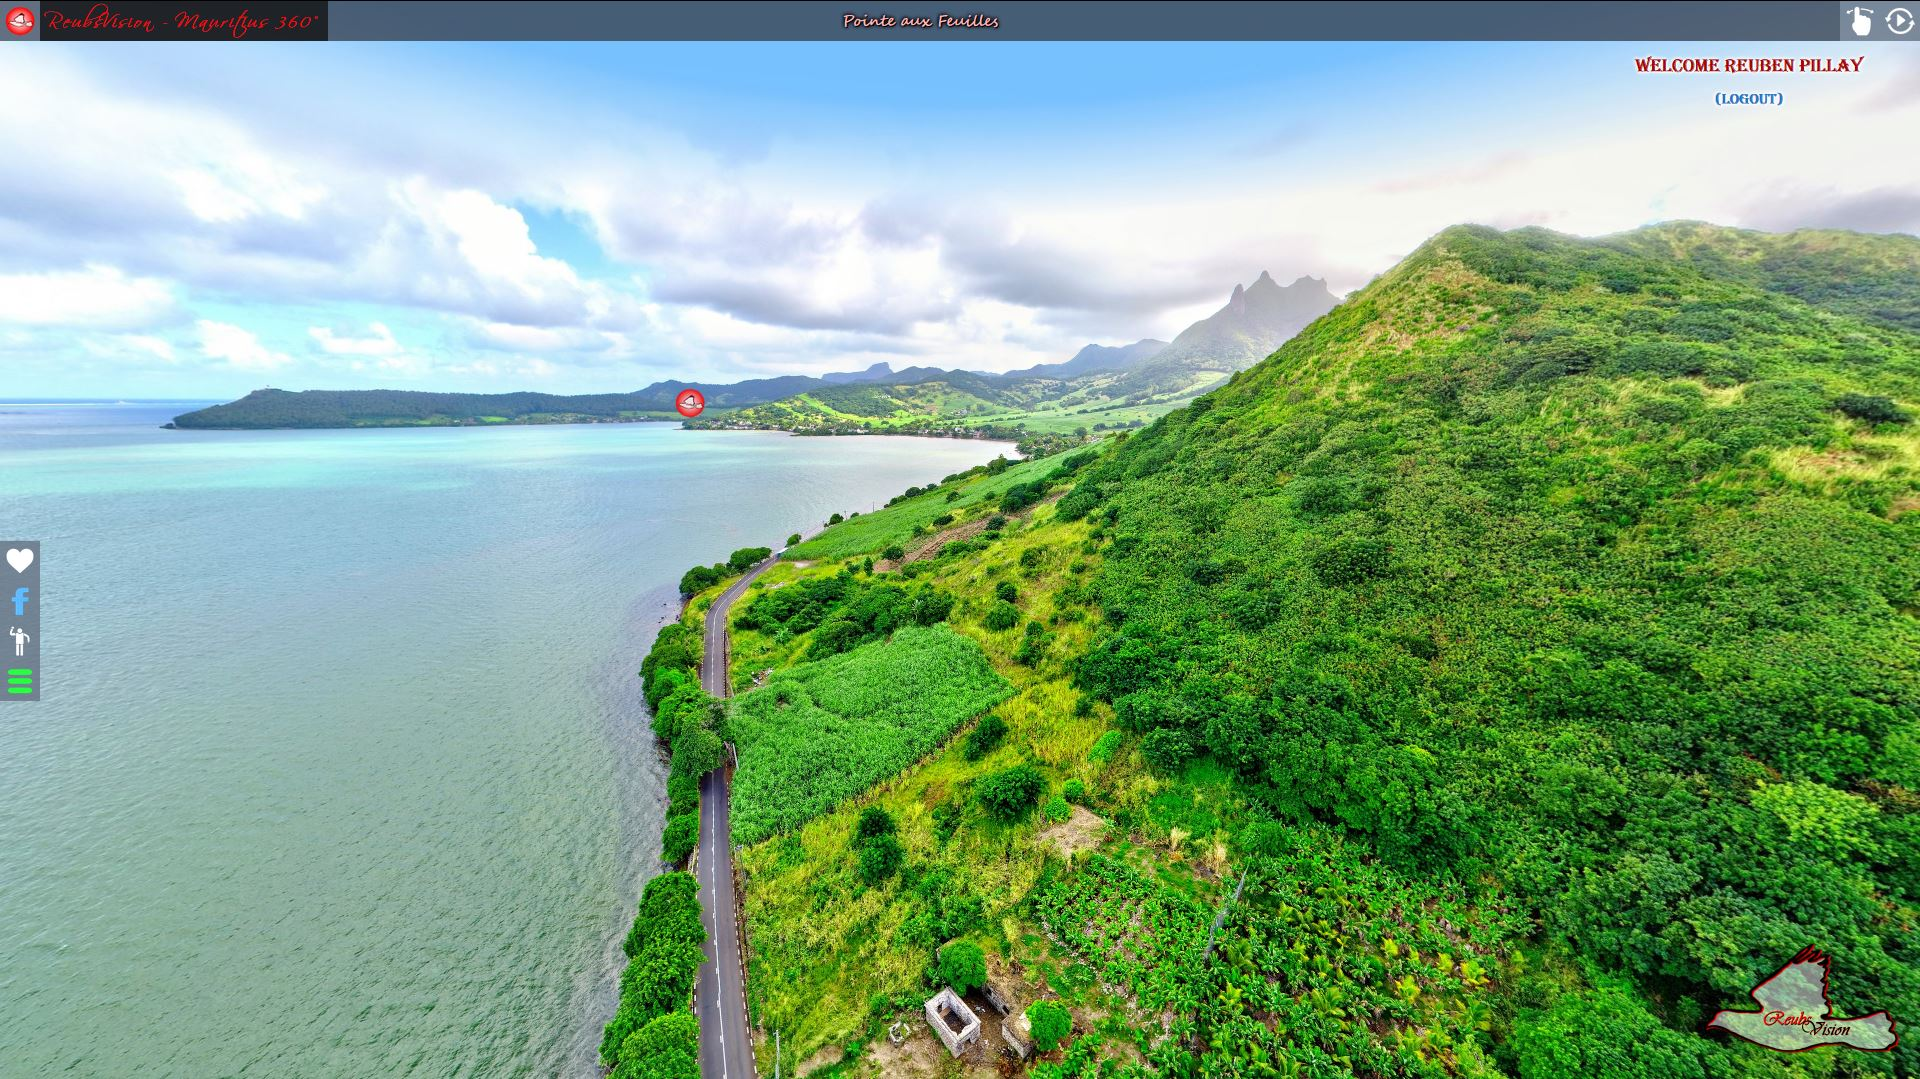 2020-06-26 01_42_13-ReubsVision – Mauritius 360 – Firefox Developer Edition